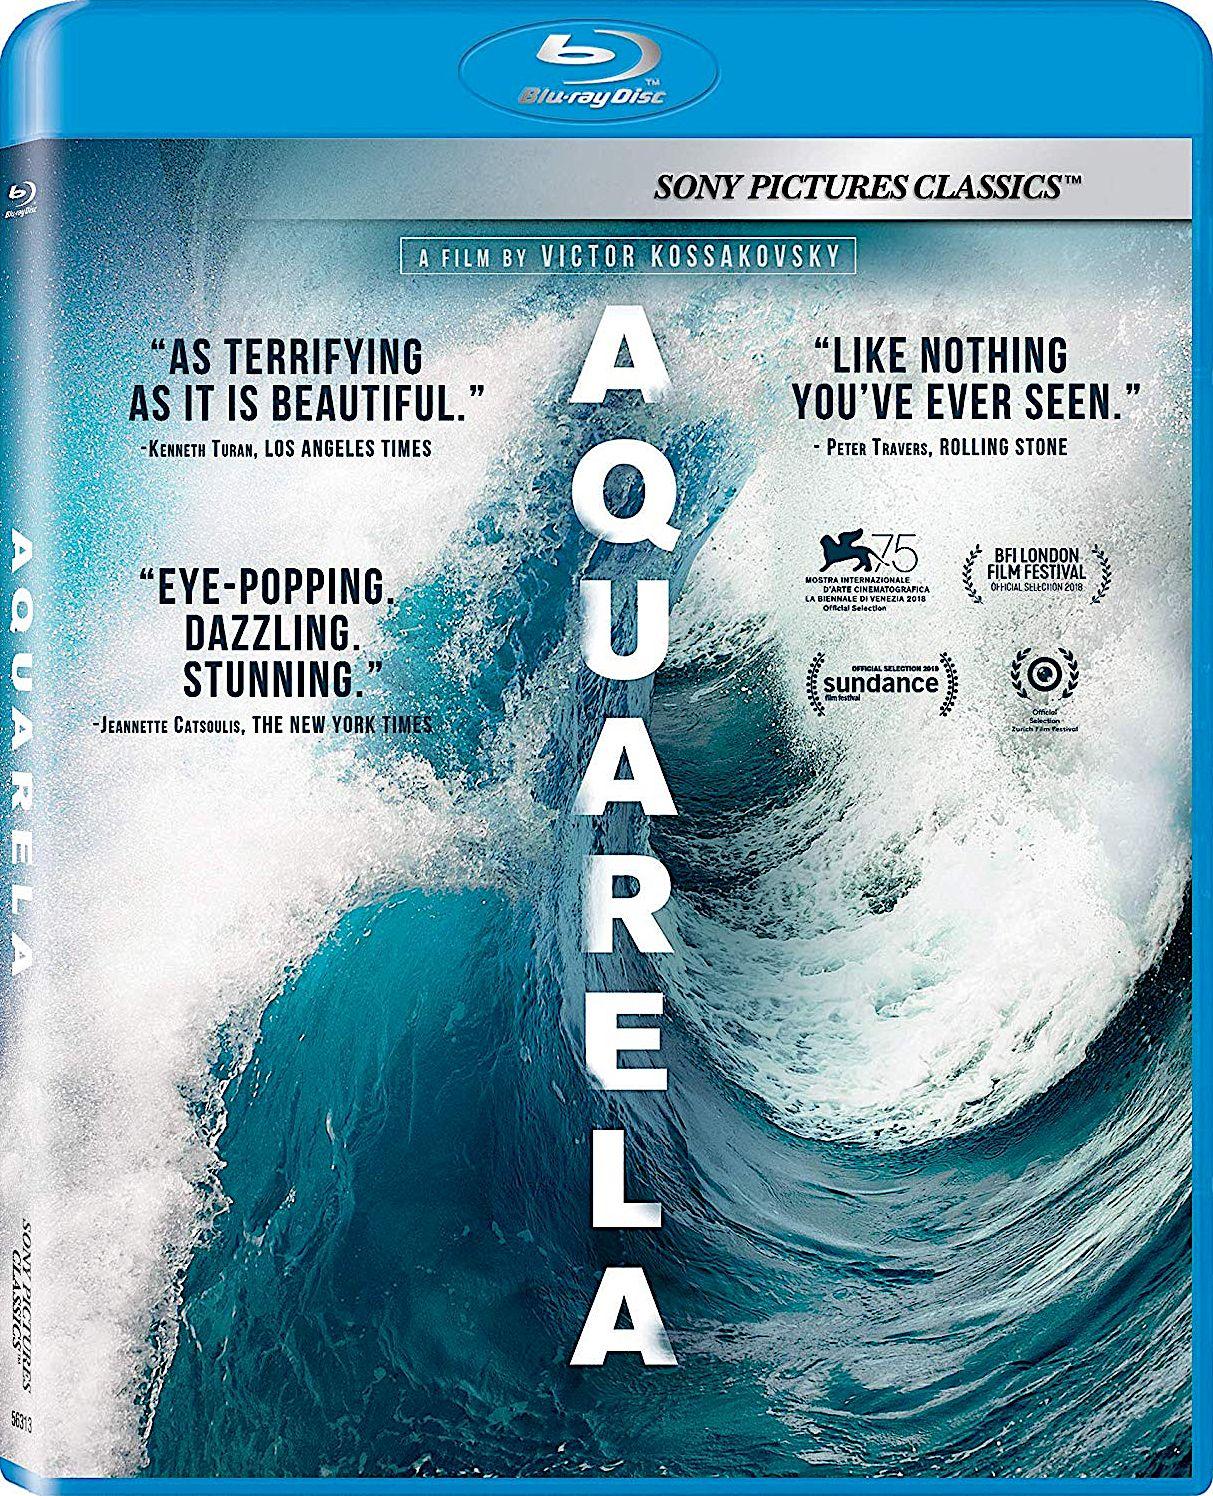 Aquarela Blu Ray Sony Pictures Classics Sony Pictures Classics